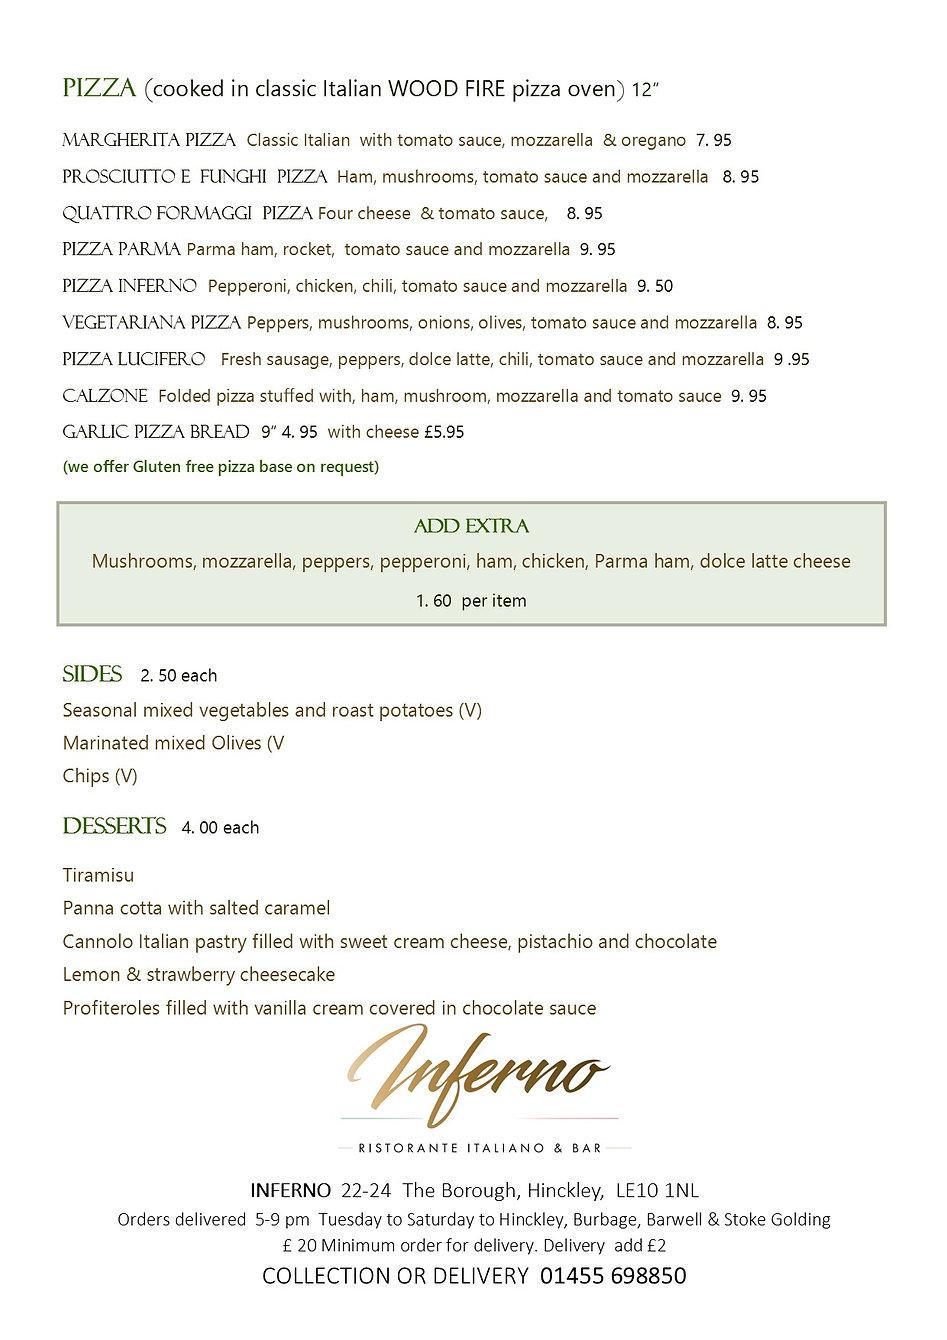 take away menu page 2.jpg